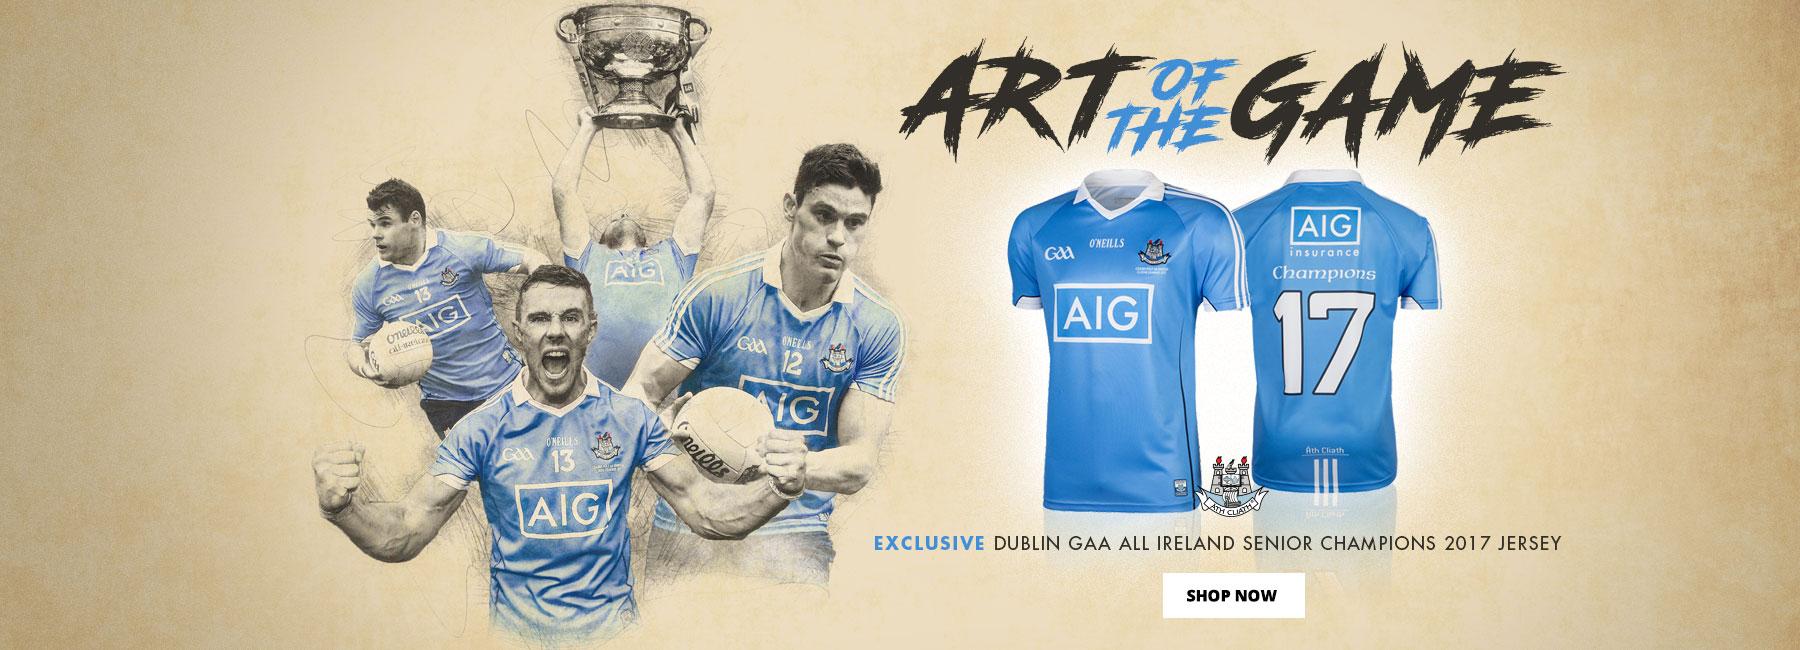 Dublin Champions 2017